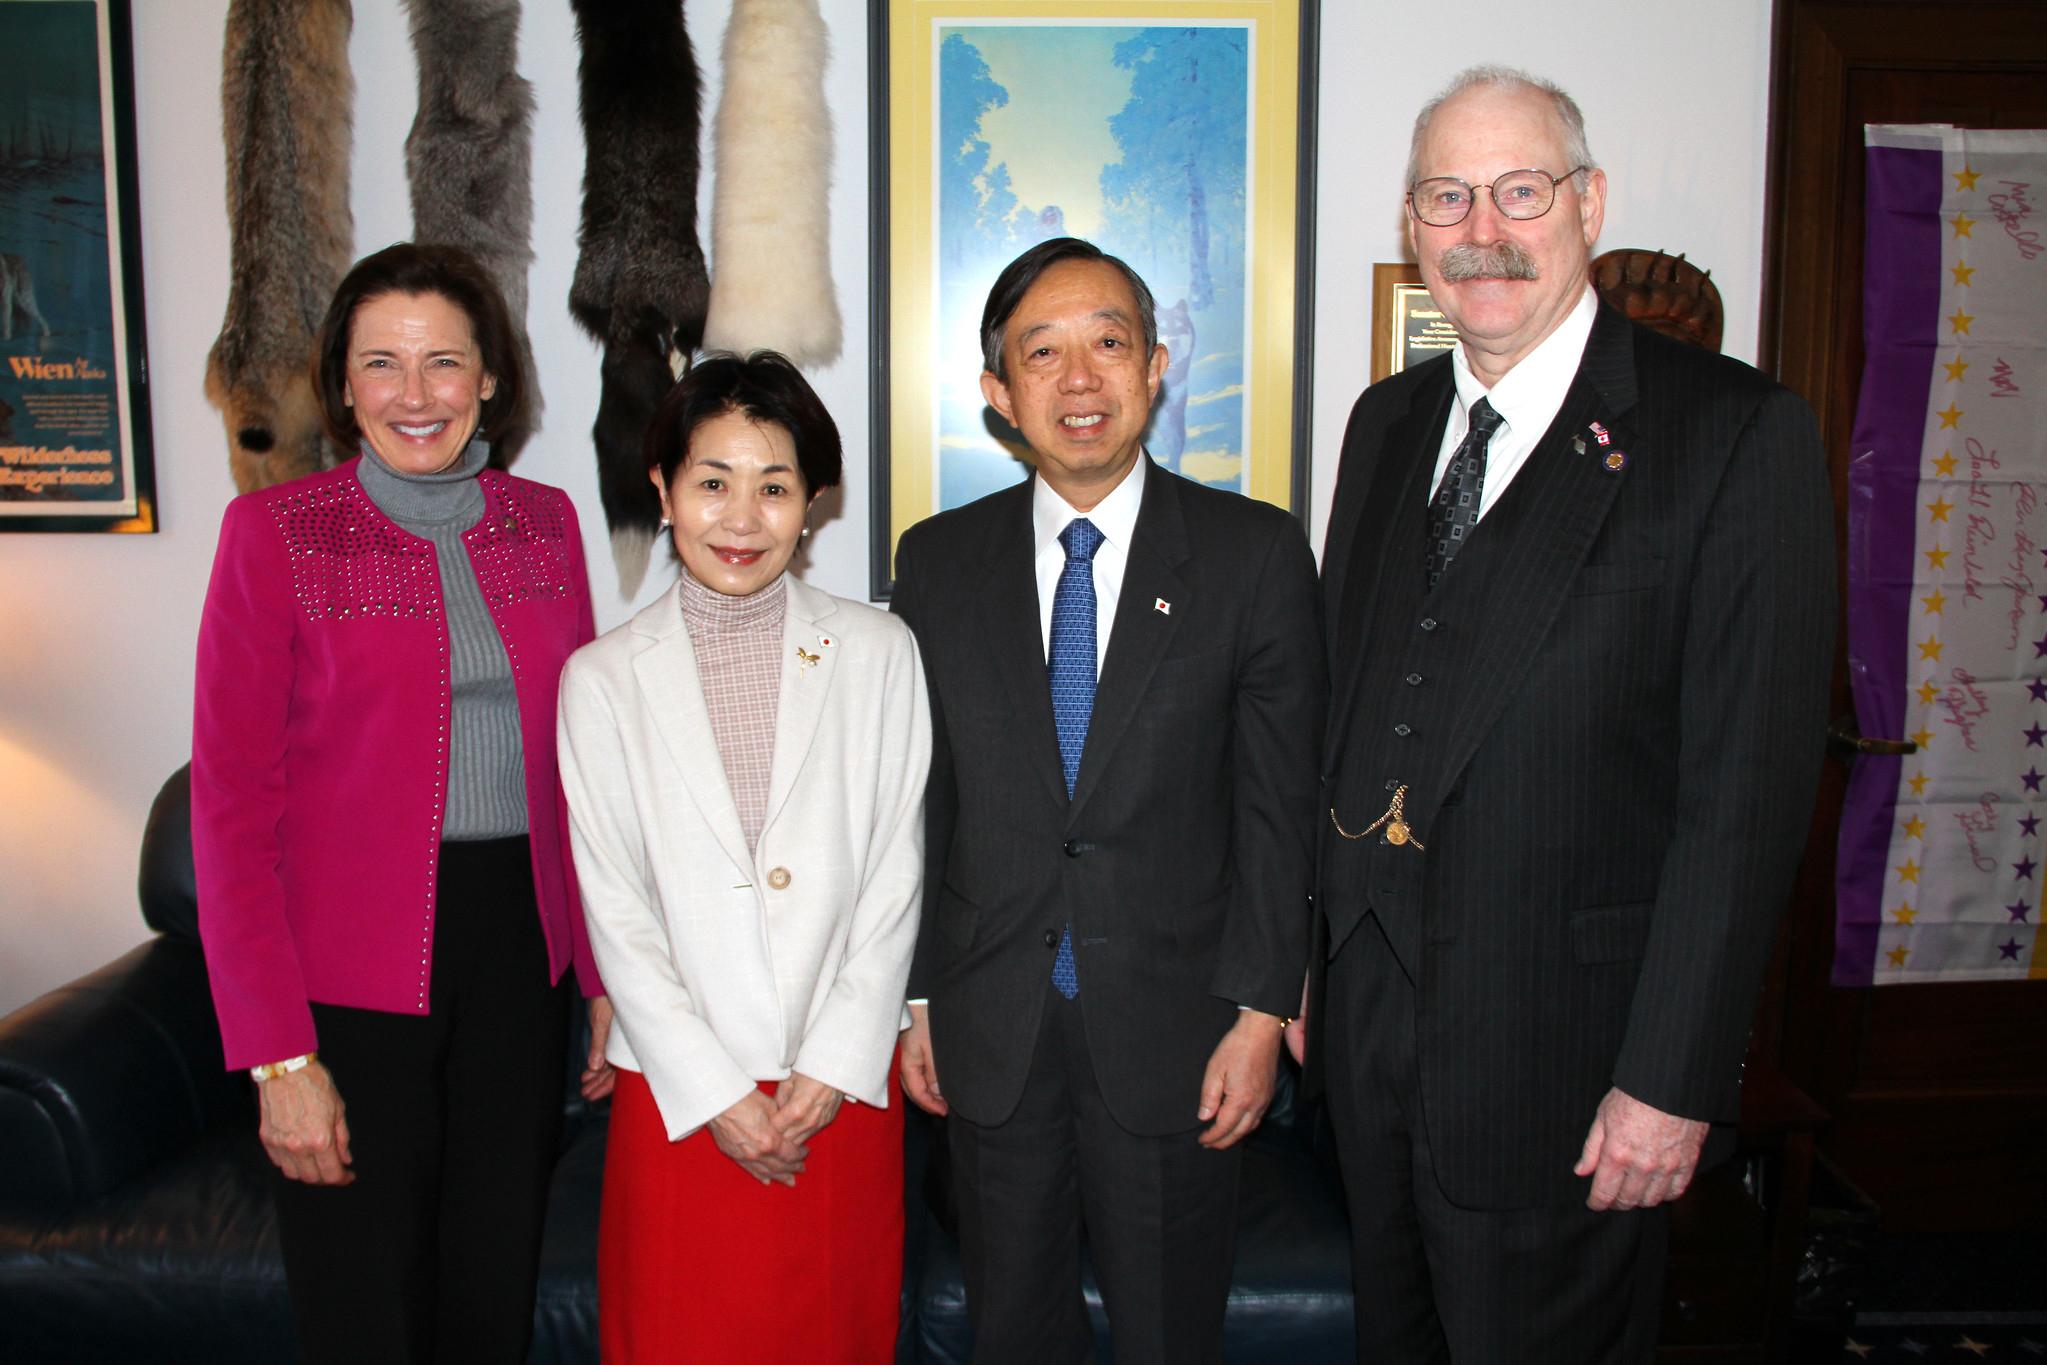 Senate President Giessel and Senator Stedman met w/  Consul Masatoshi Sato and his wife Kazue Sato